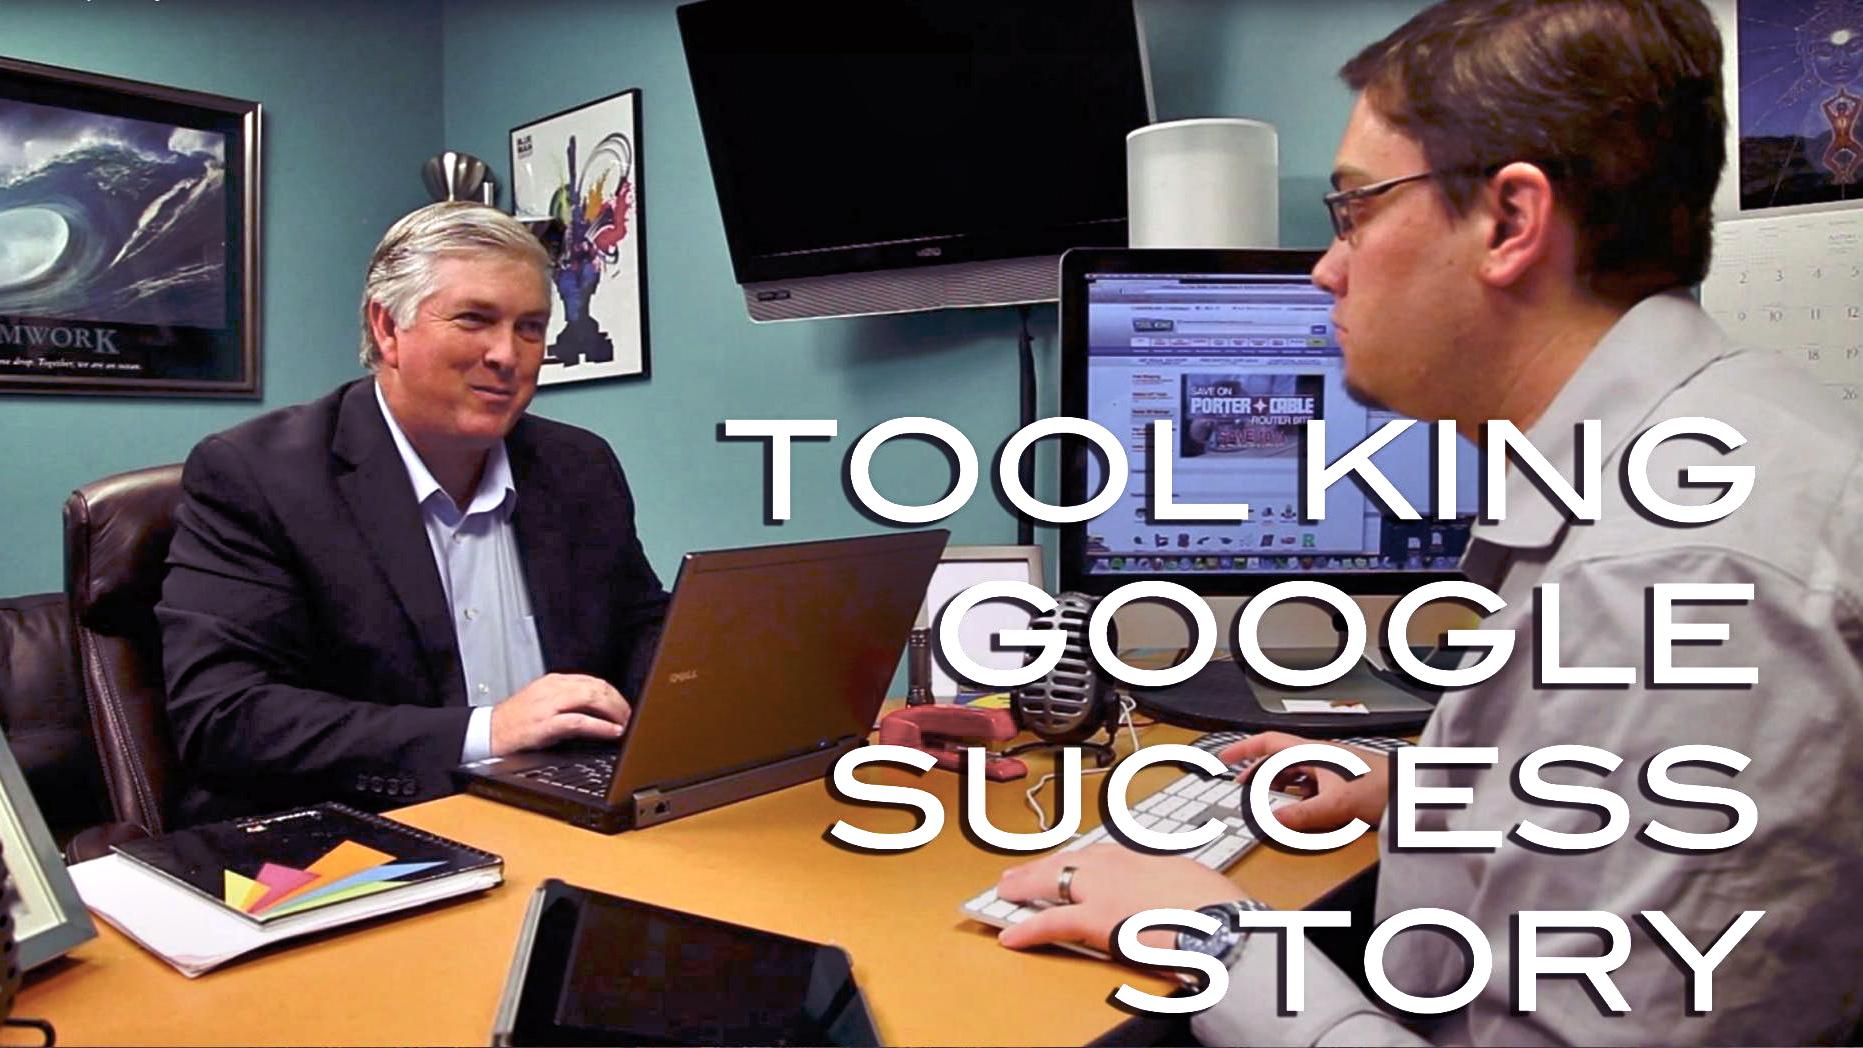 tool-king-google-success-reel